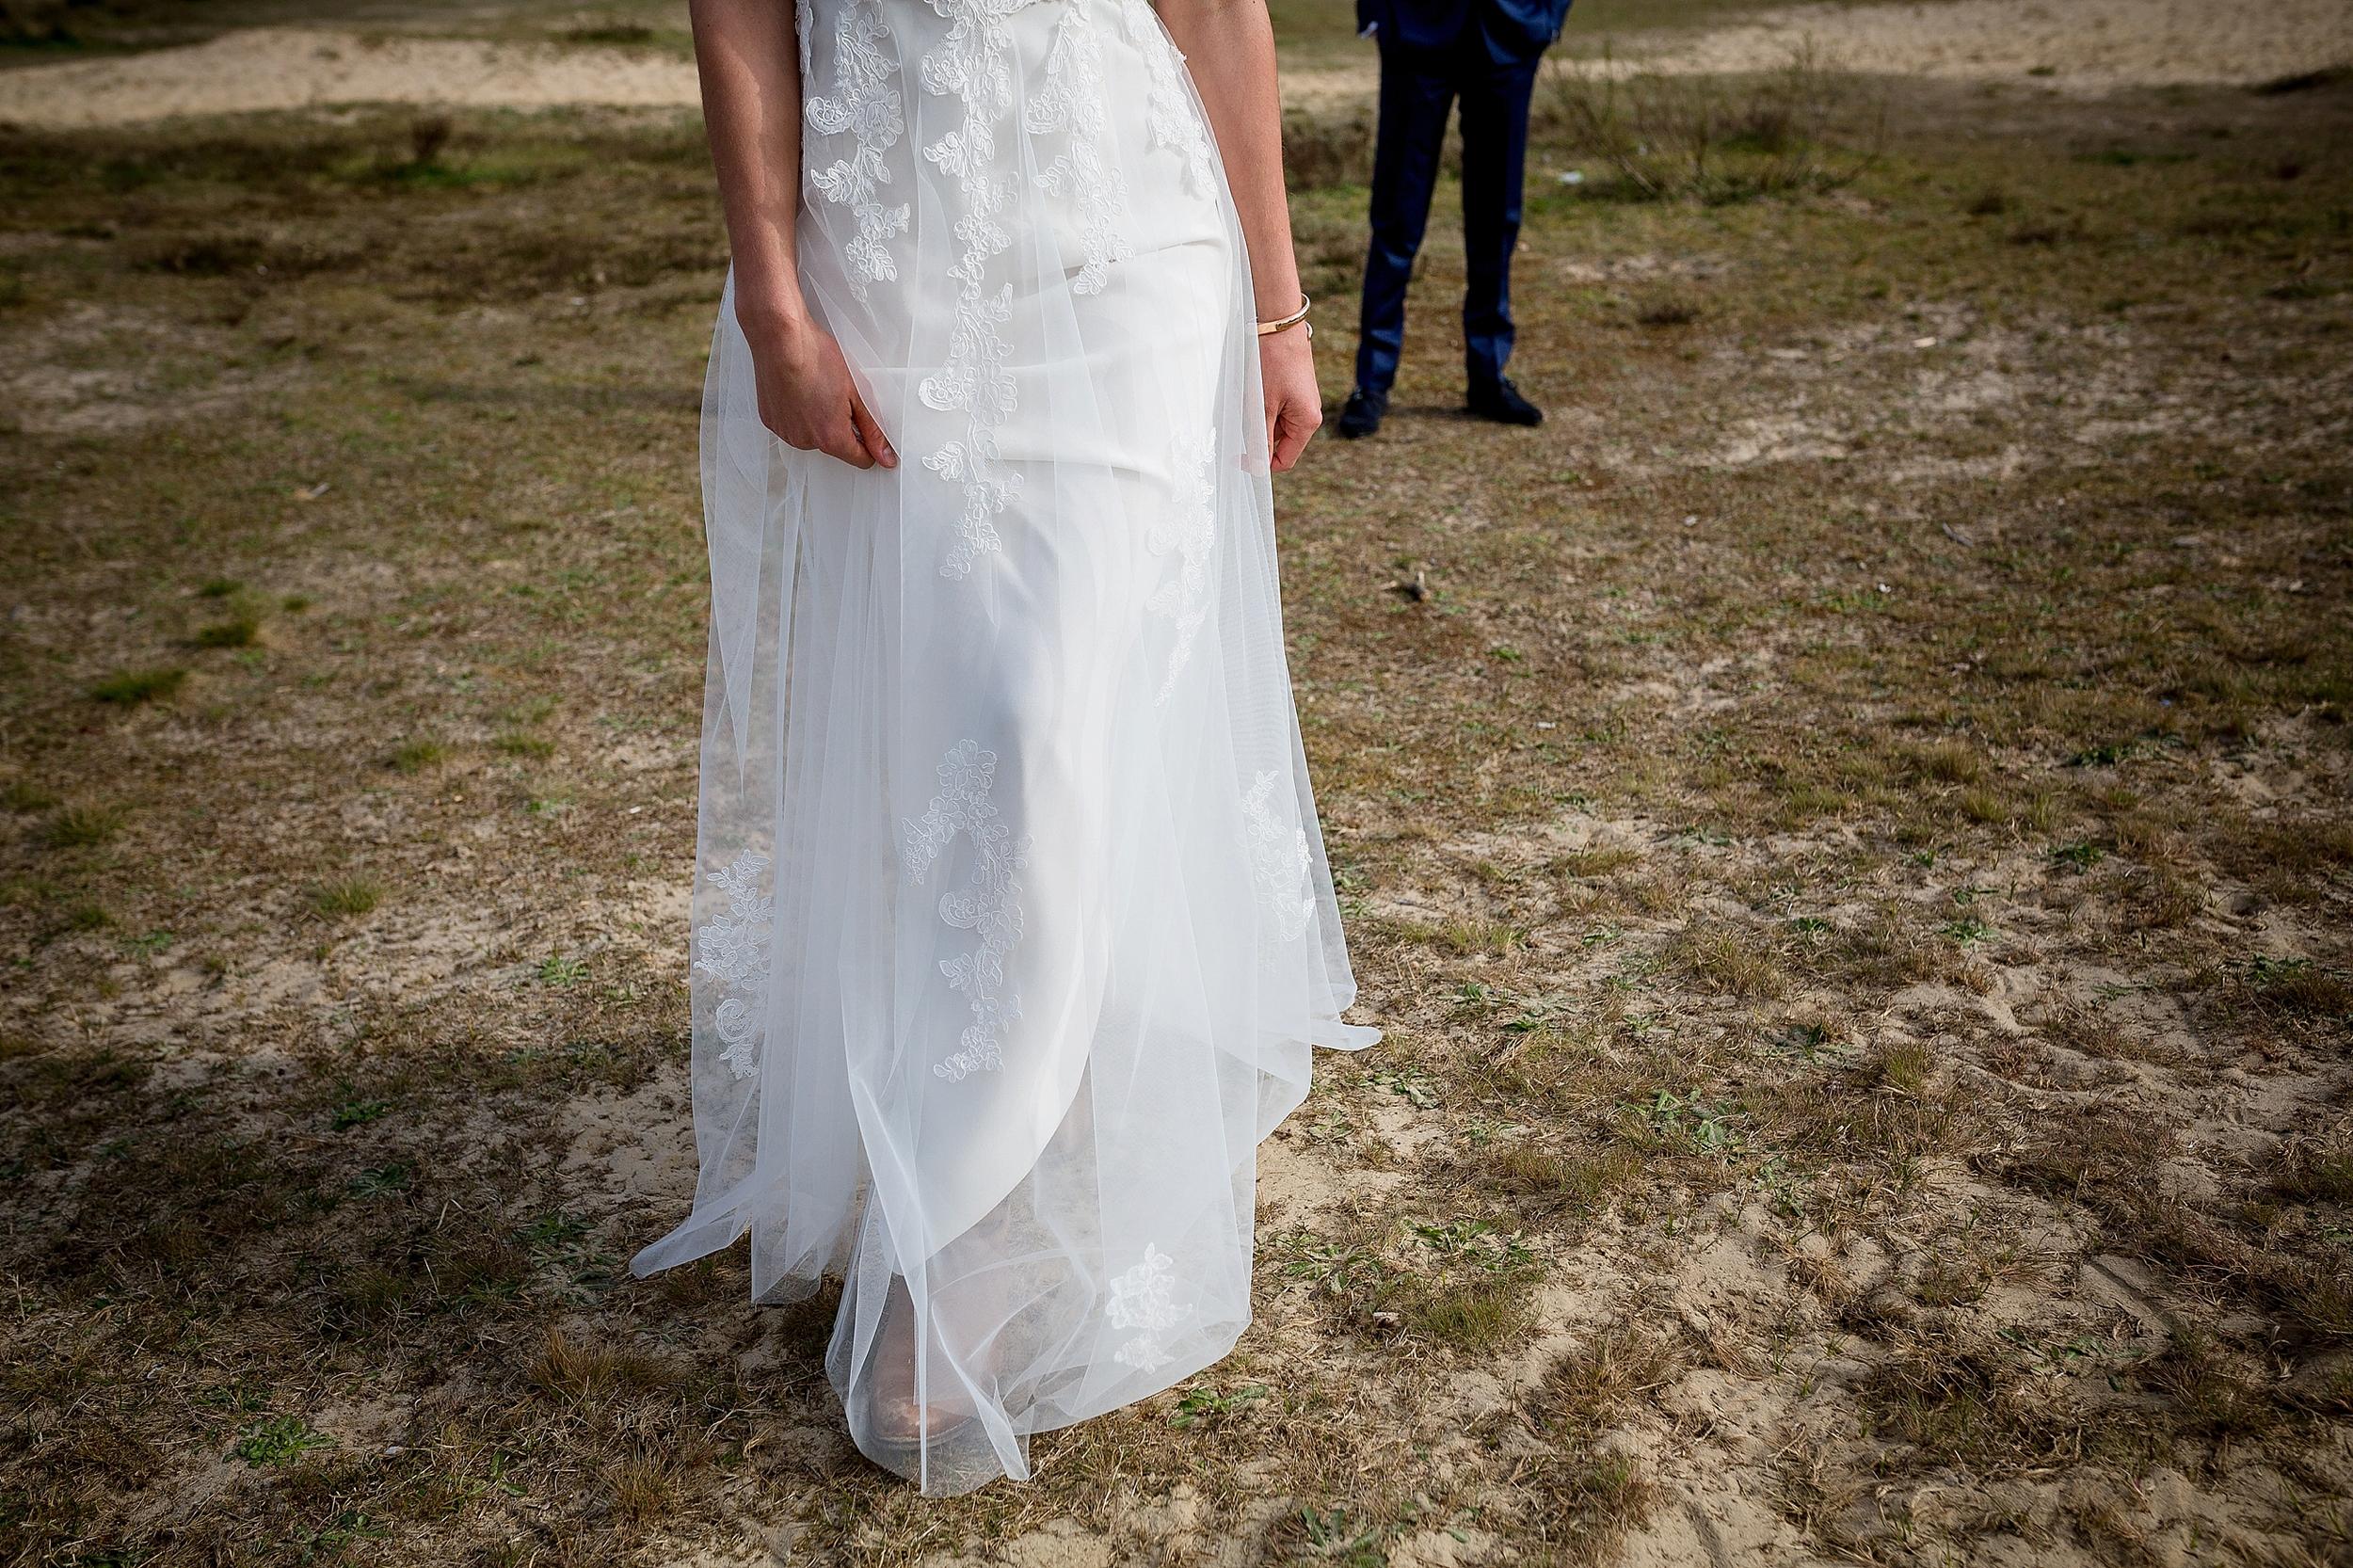 bruidsfotograaf_LNRD_middelburg_kloveniersdoelen_heide_bergen_op_zoom_0617.jpg